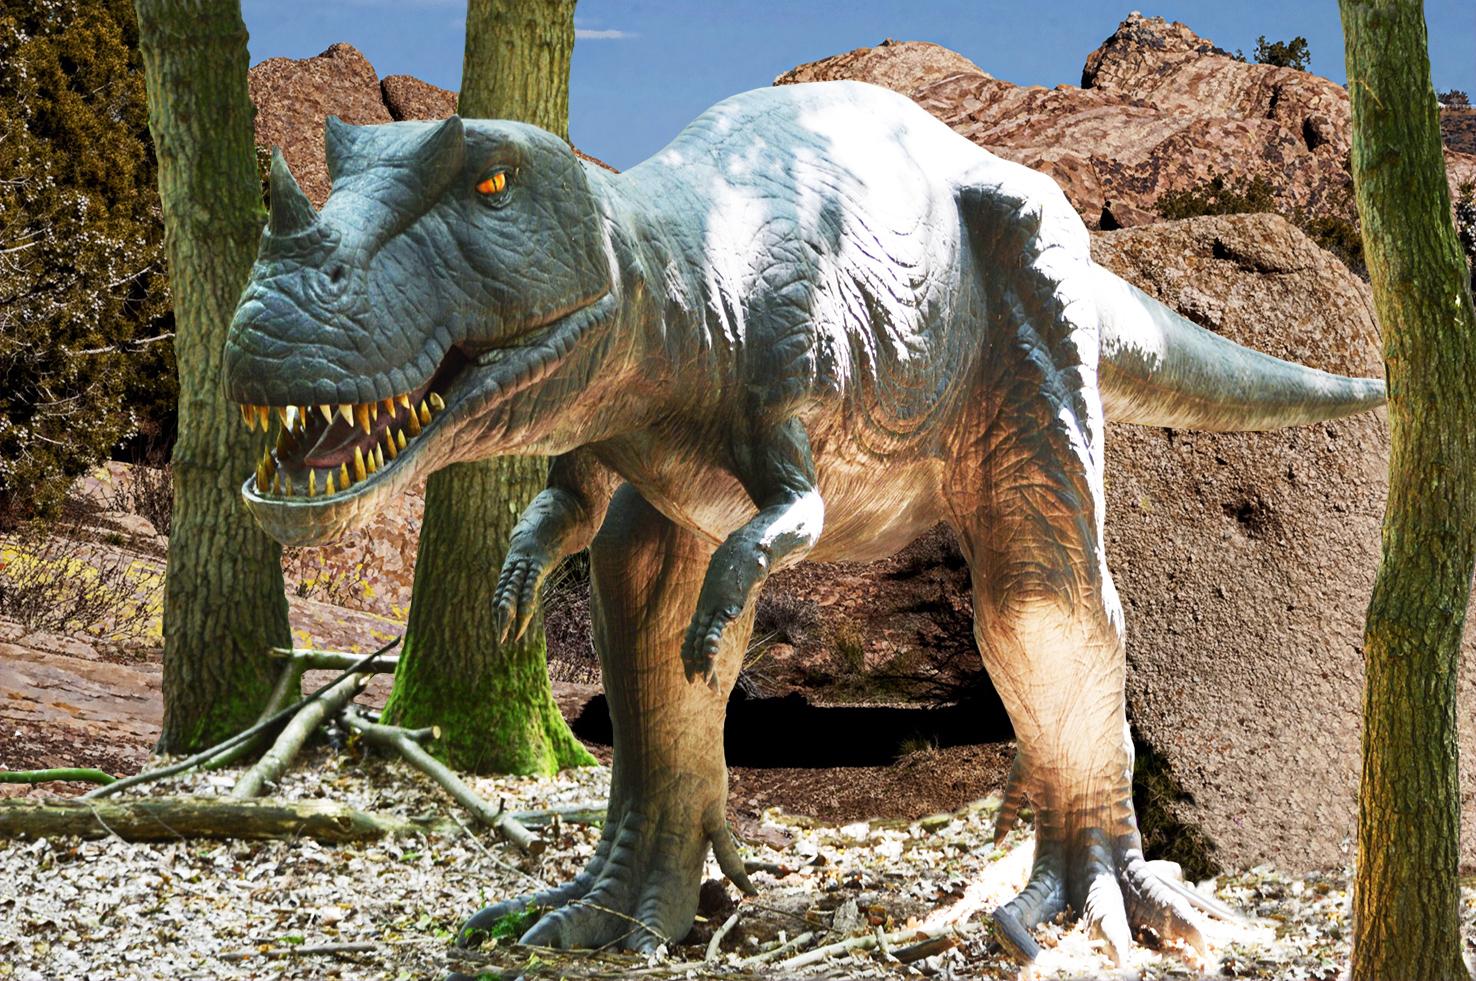 dinosaur picture of carnivore dinosaur